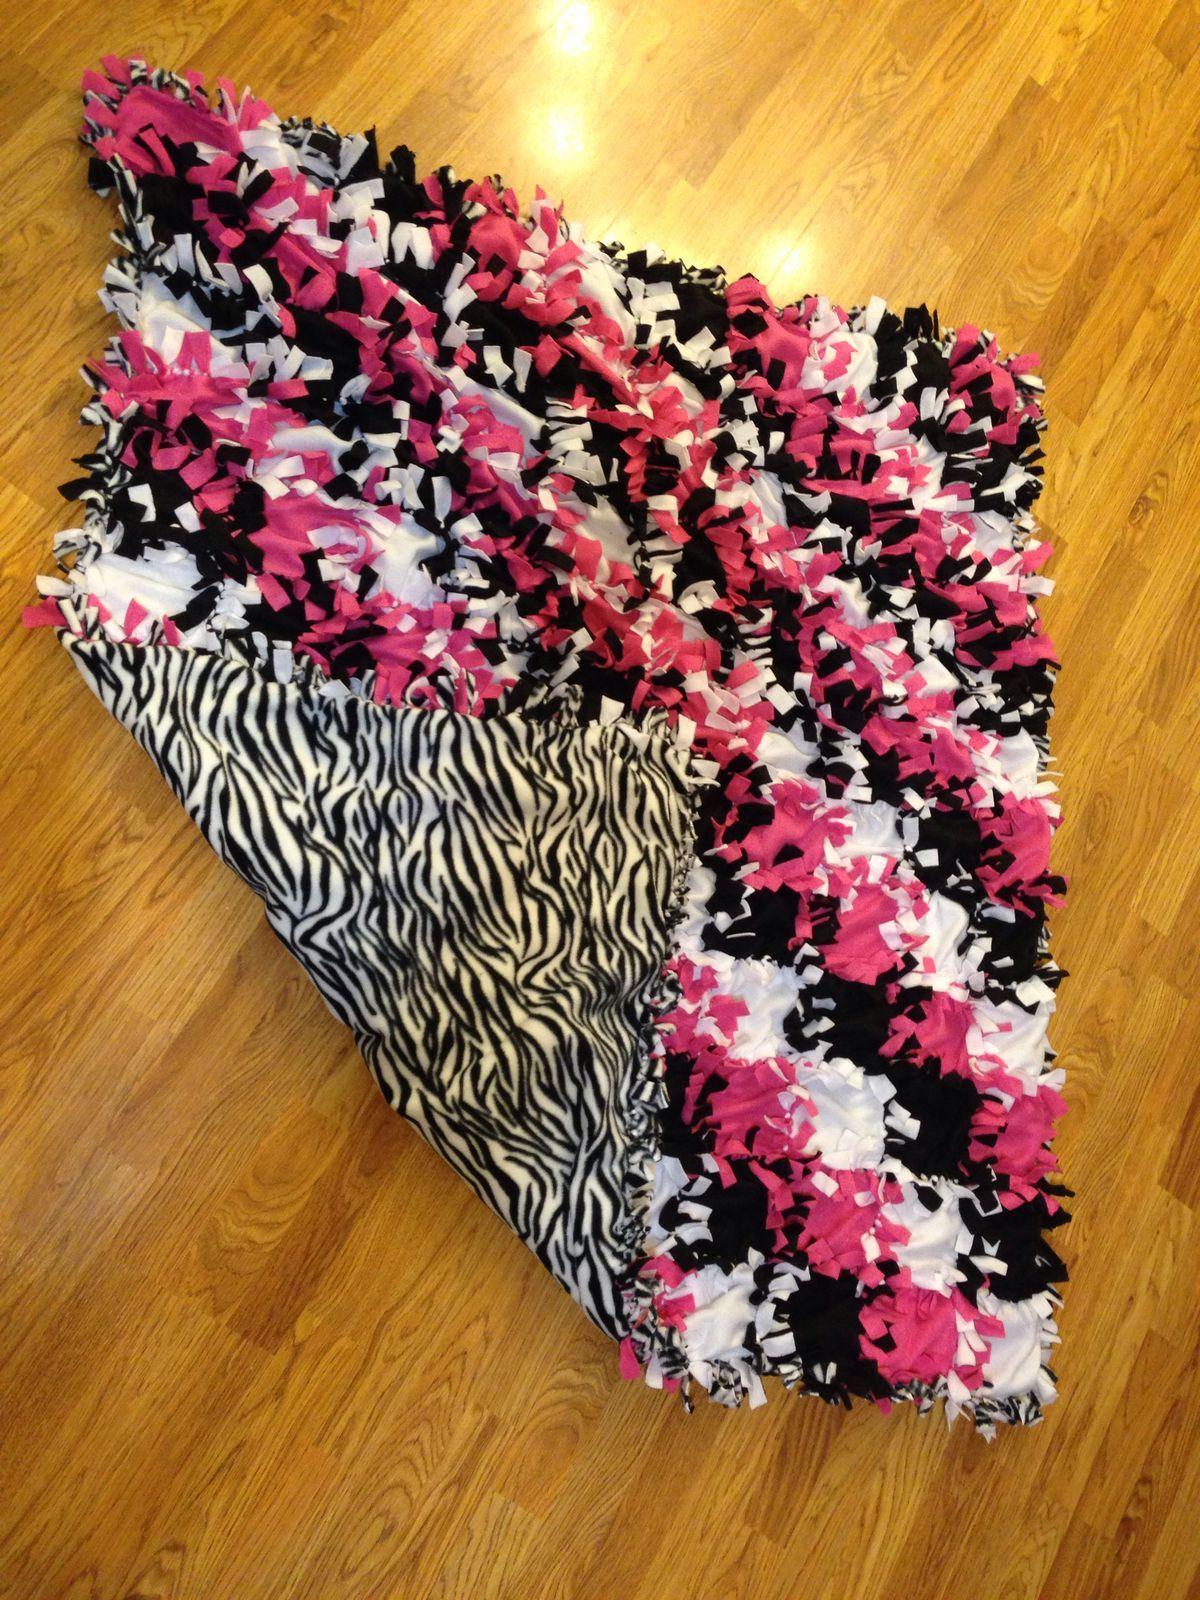 Diy no sew blanket. | DIY Heaven | Pinterest | Blanket, Craft and ... : no sew quilts - Adamdwight.com